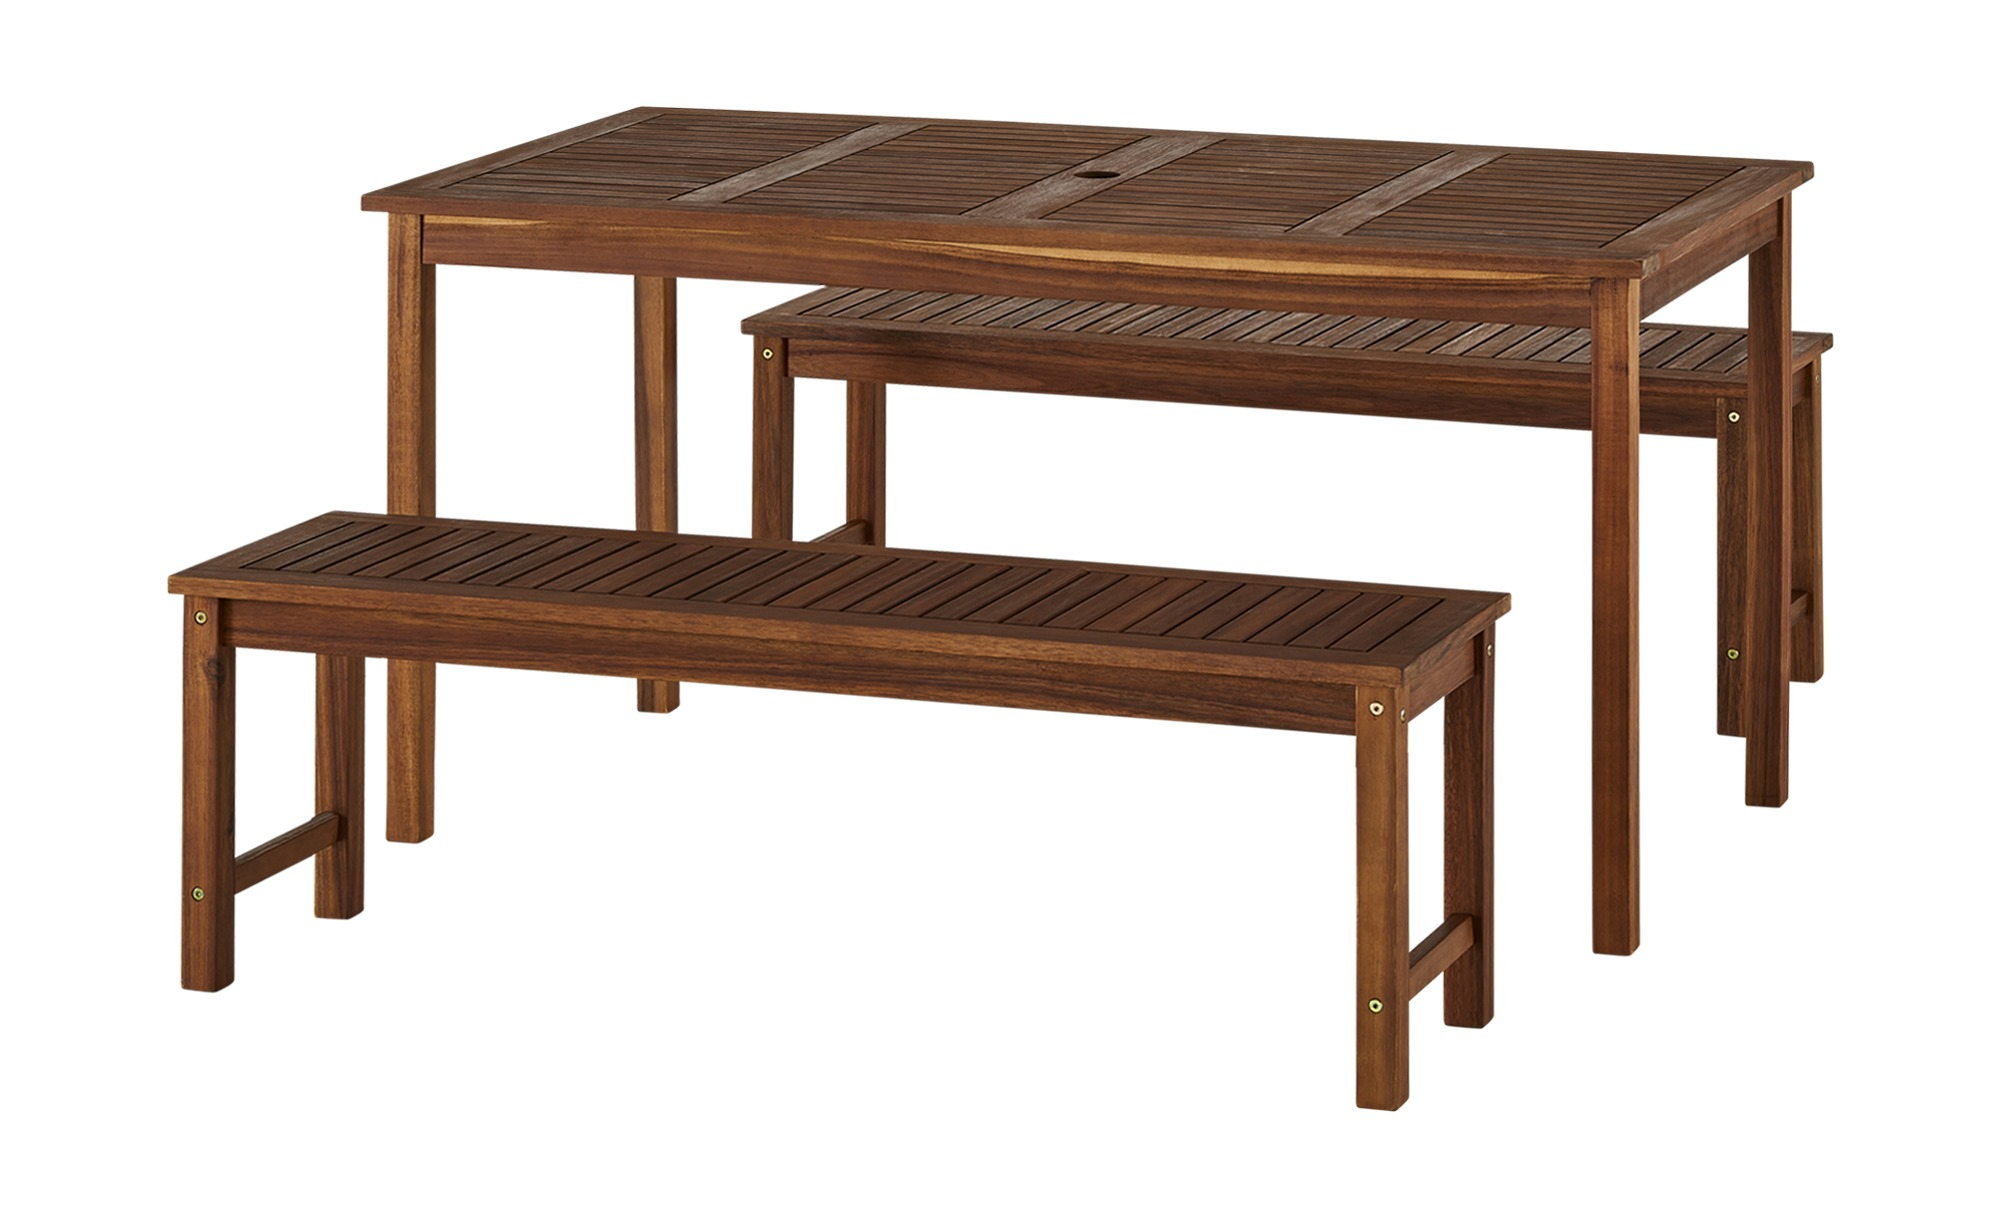 Holzfarben Holz Gartenmobel Set Online Kaufen Mobel